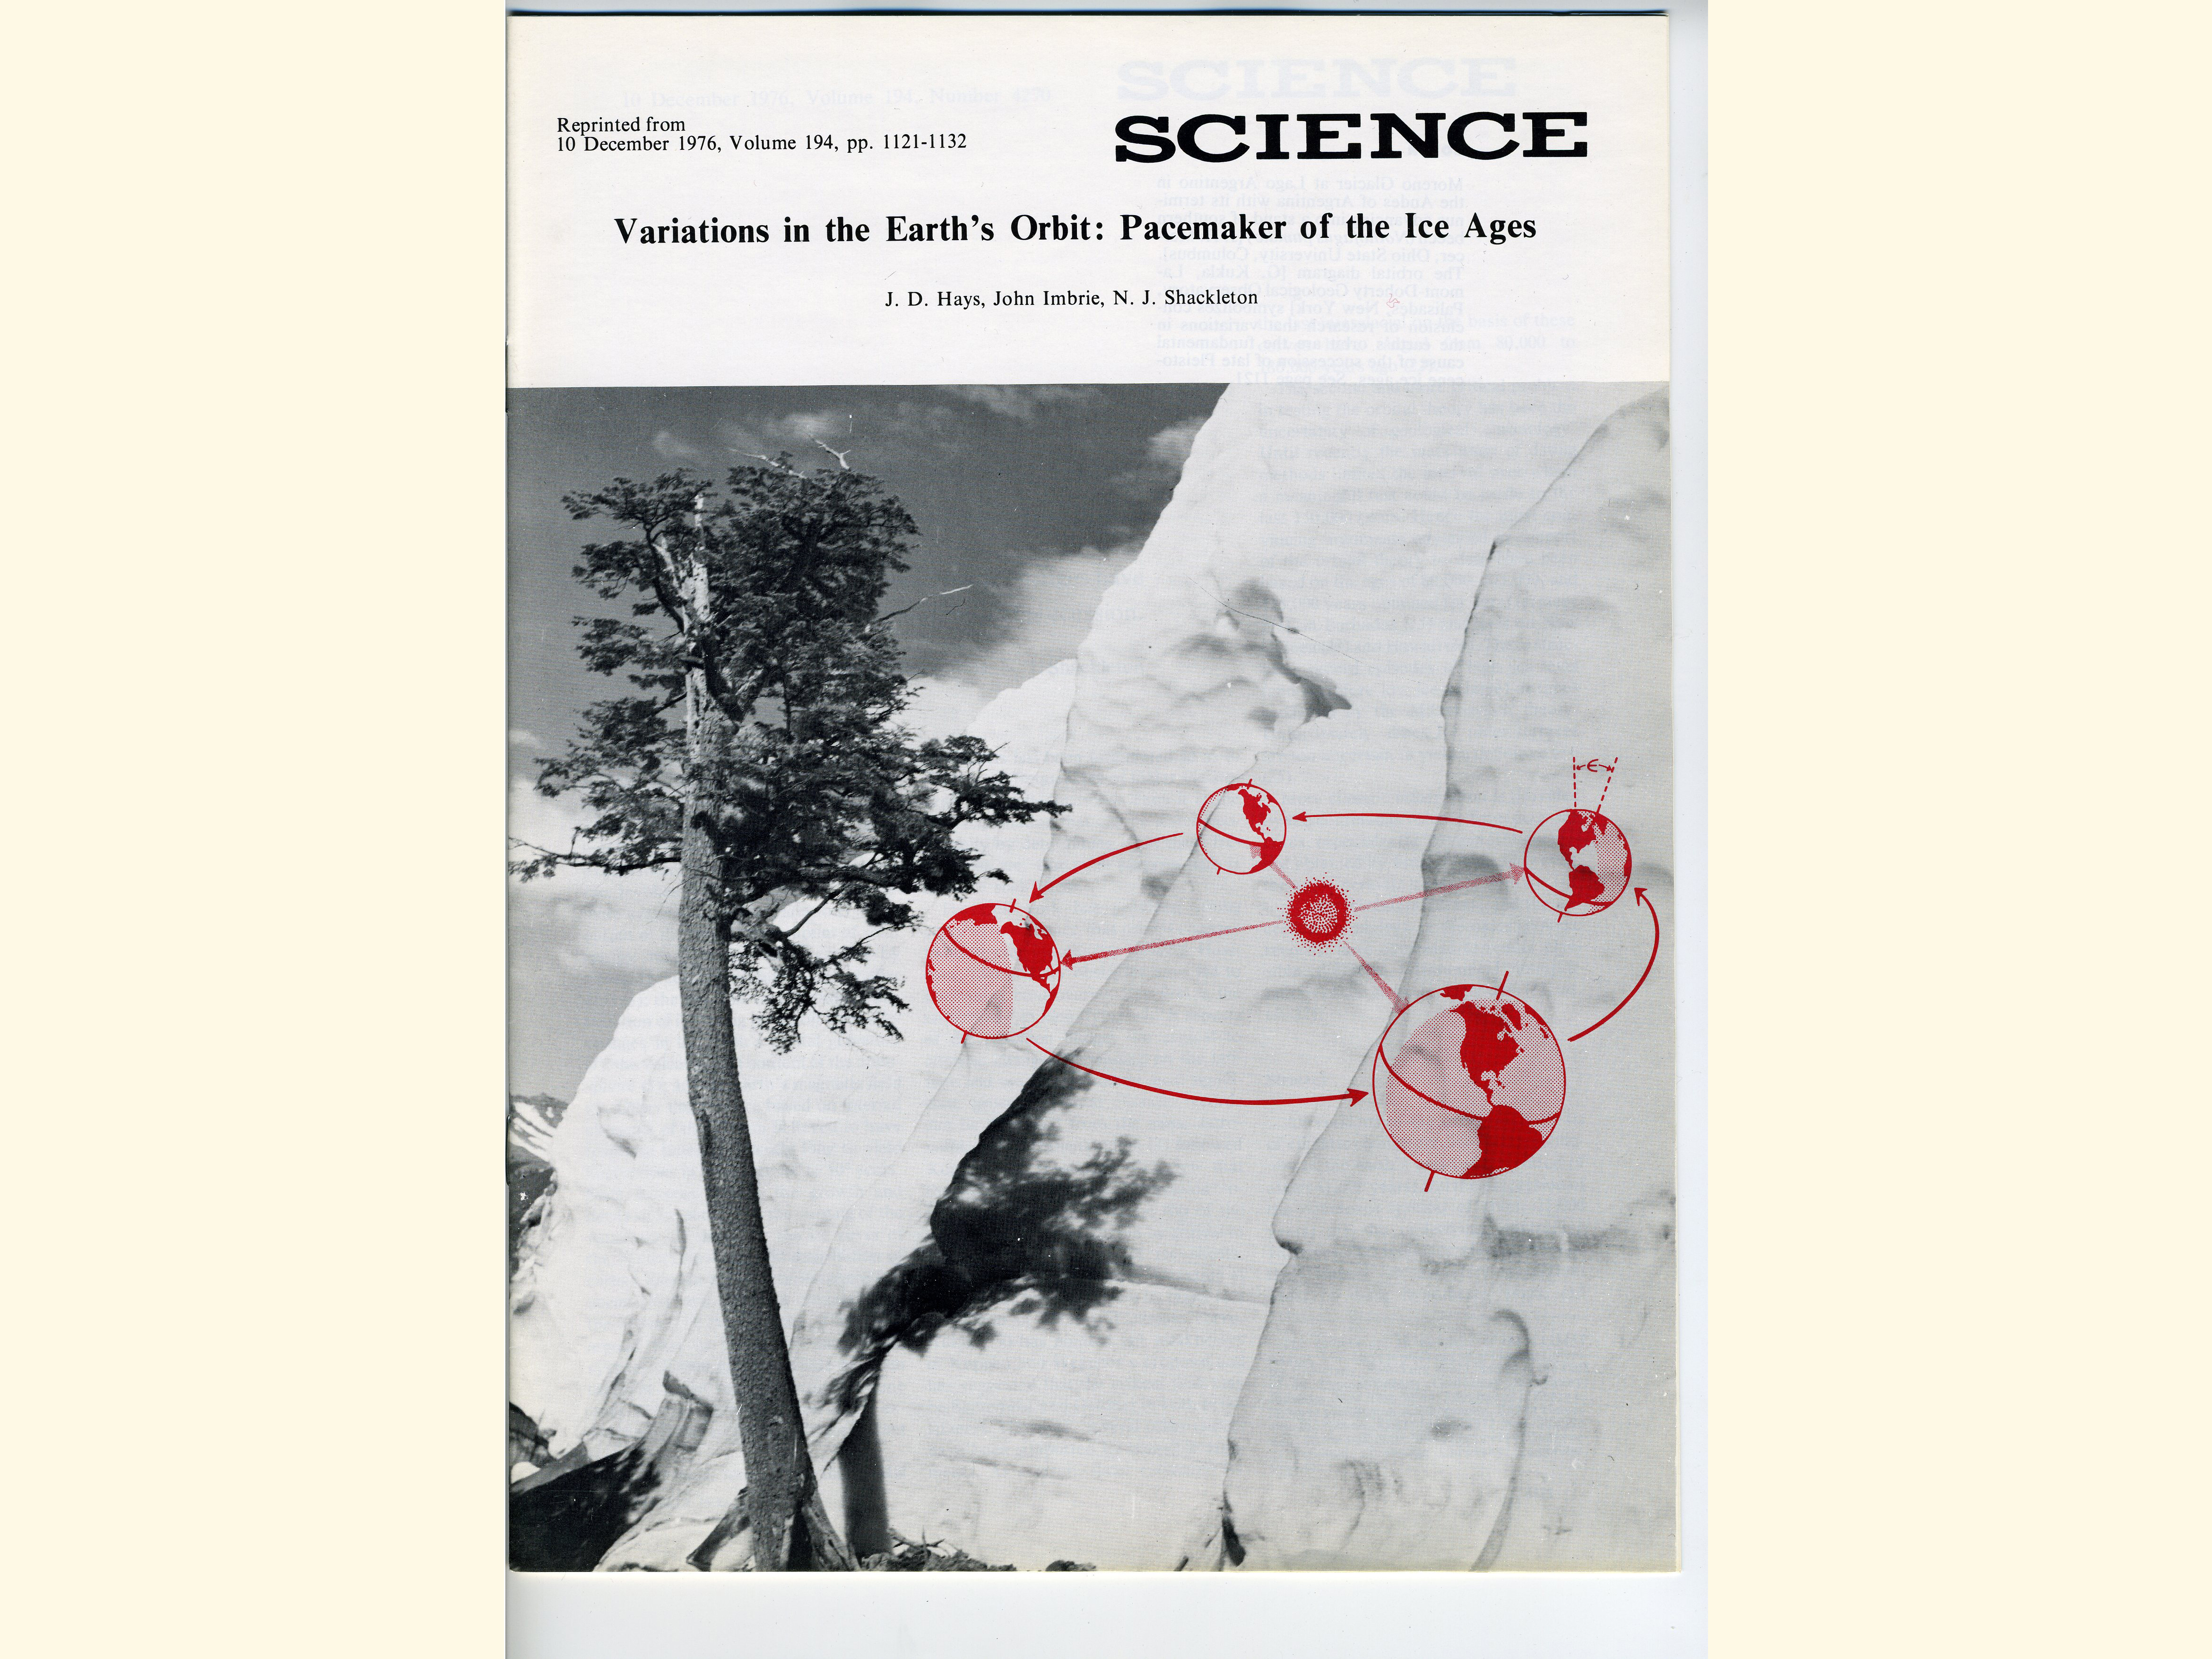 Science-study-1976 copy